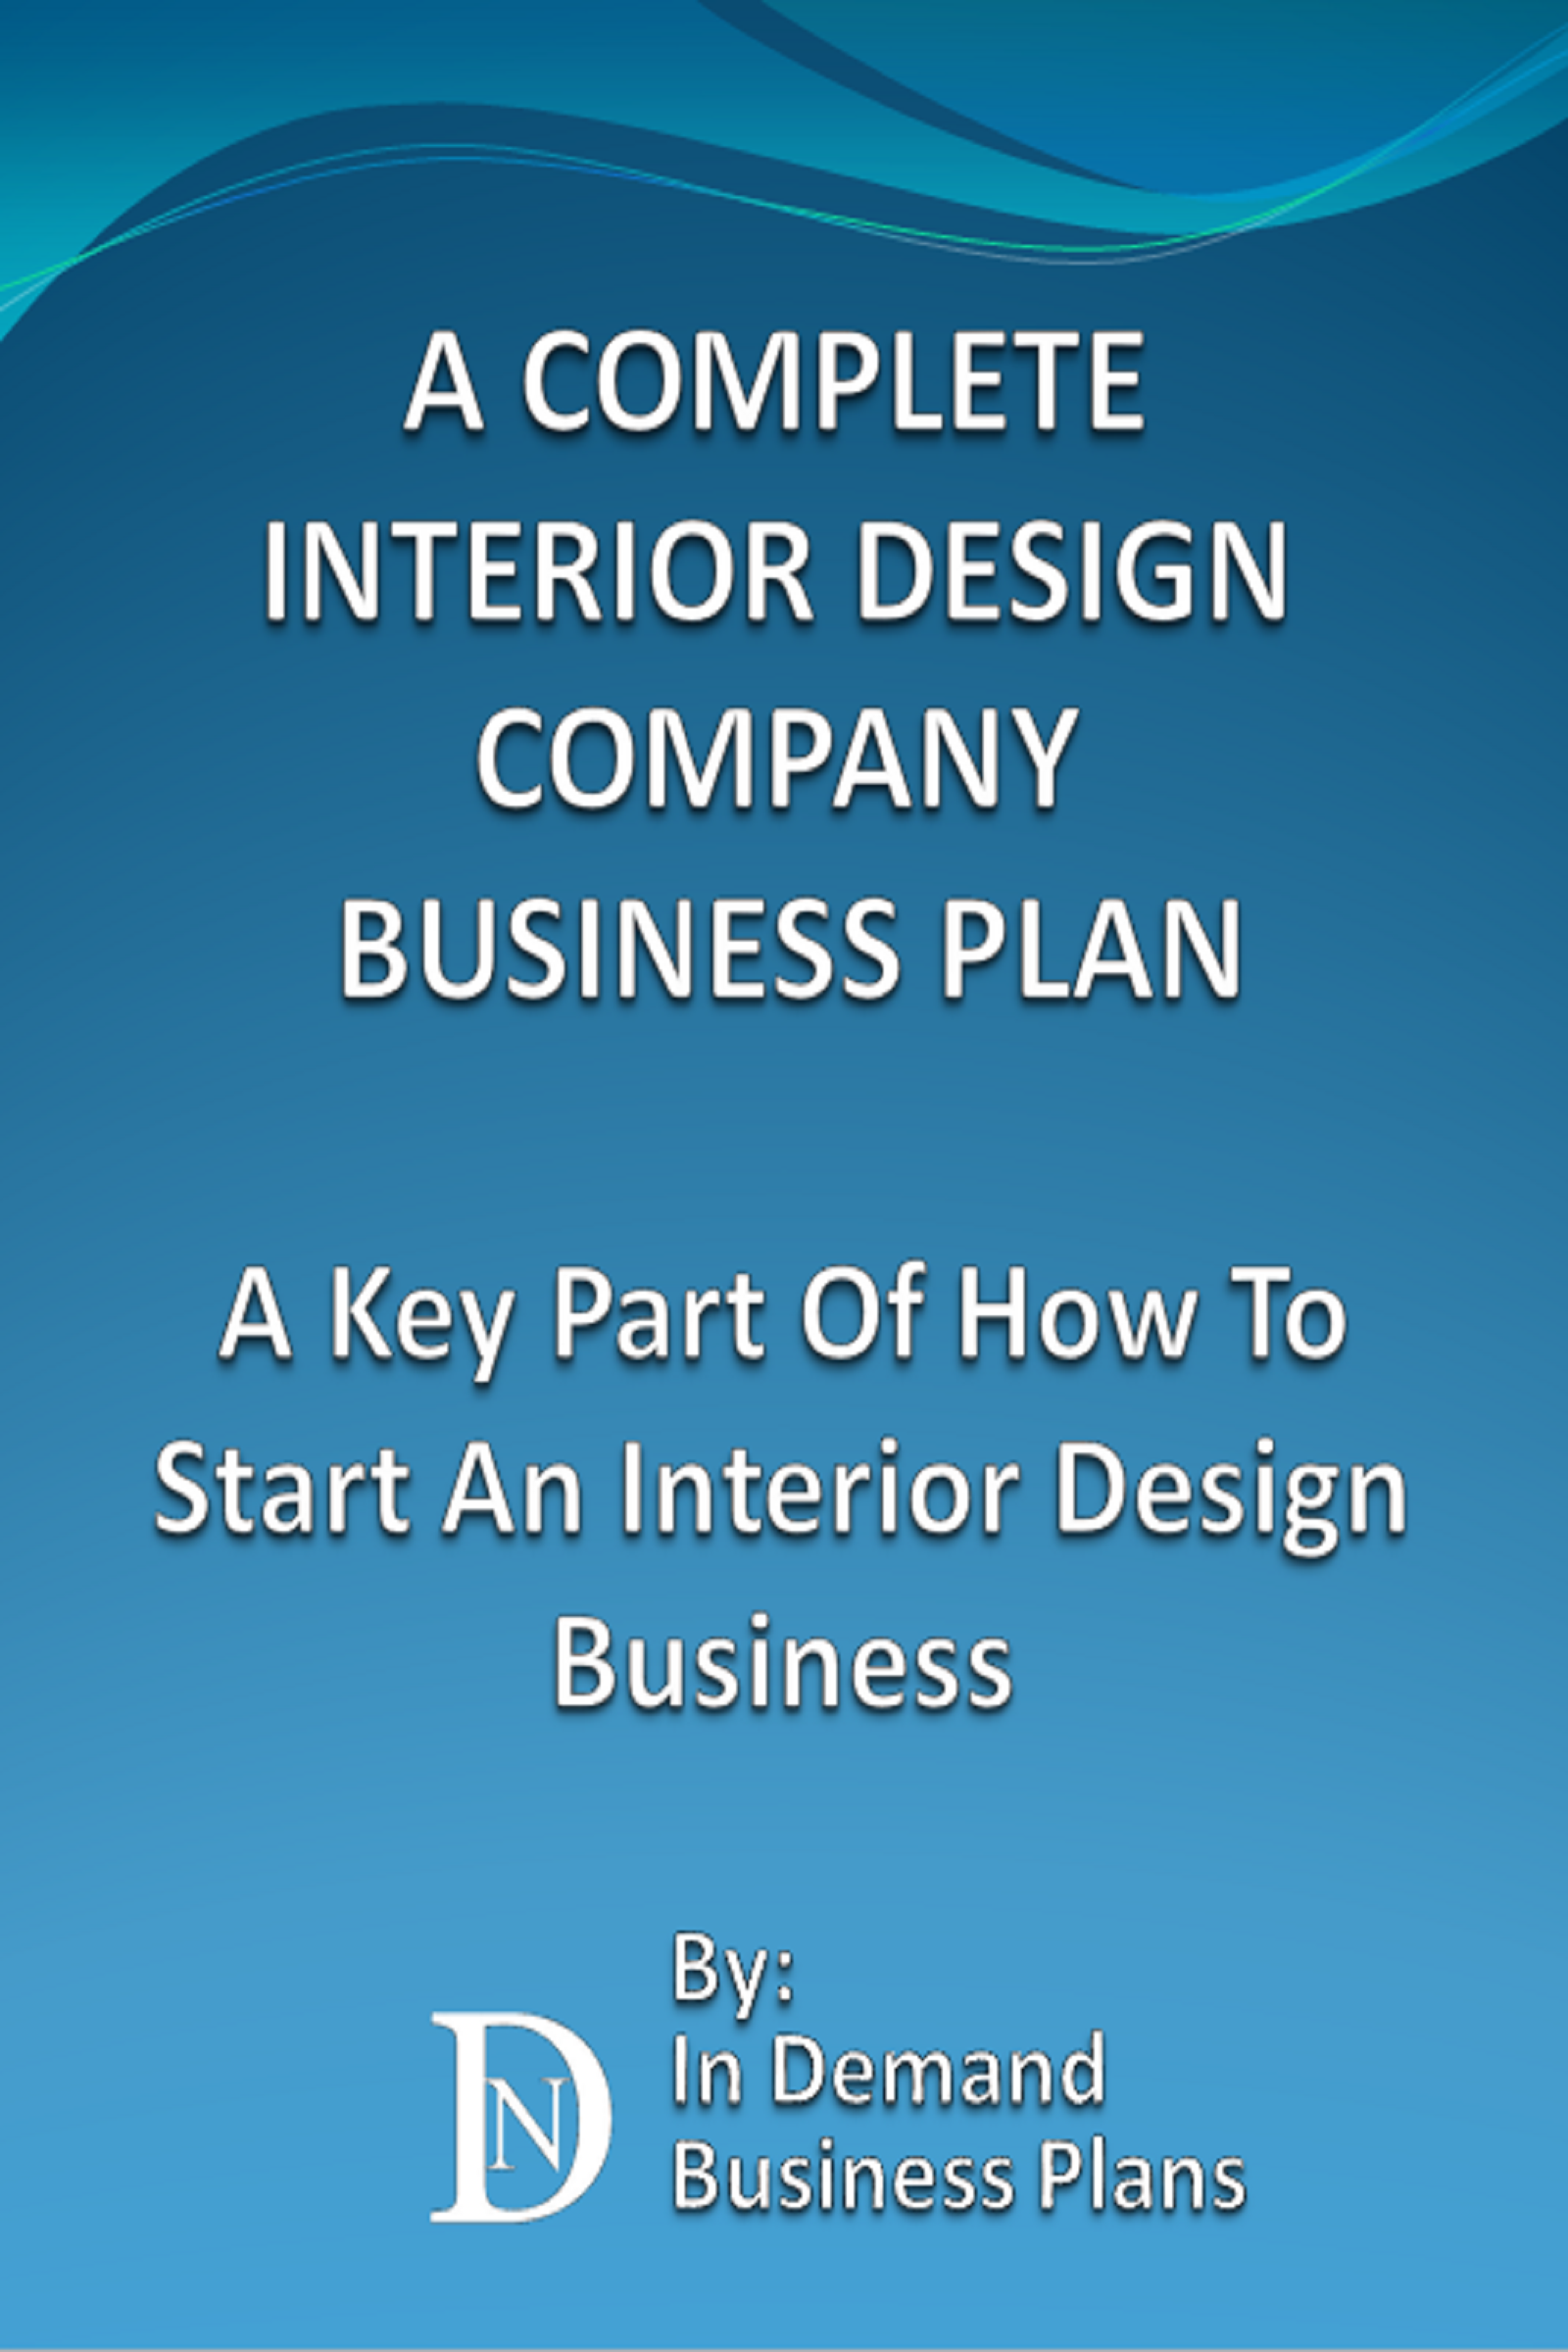 Business Plan Interior Design Firm